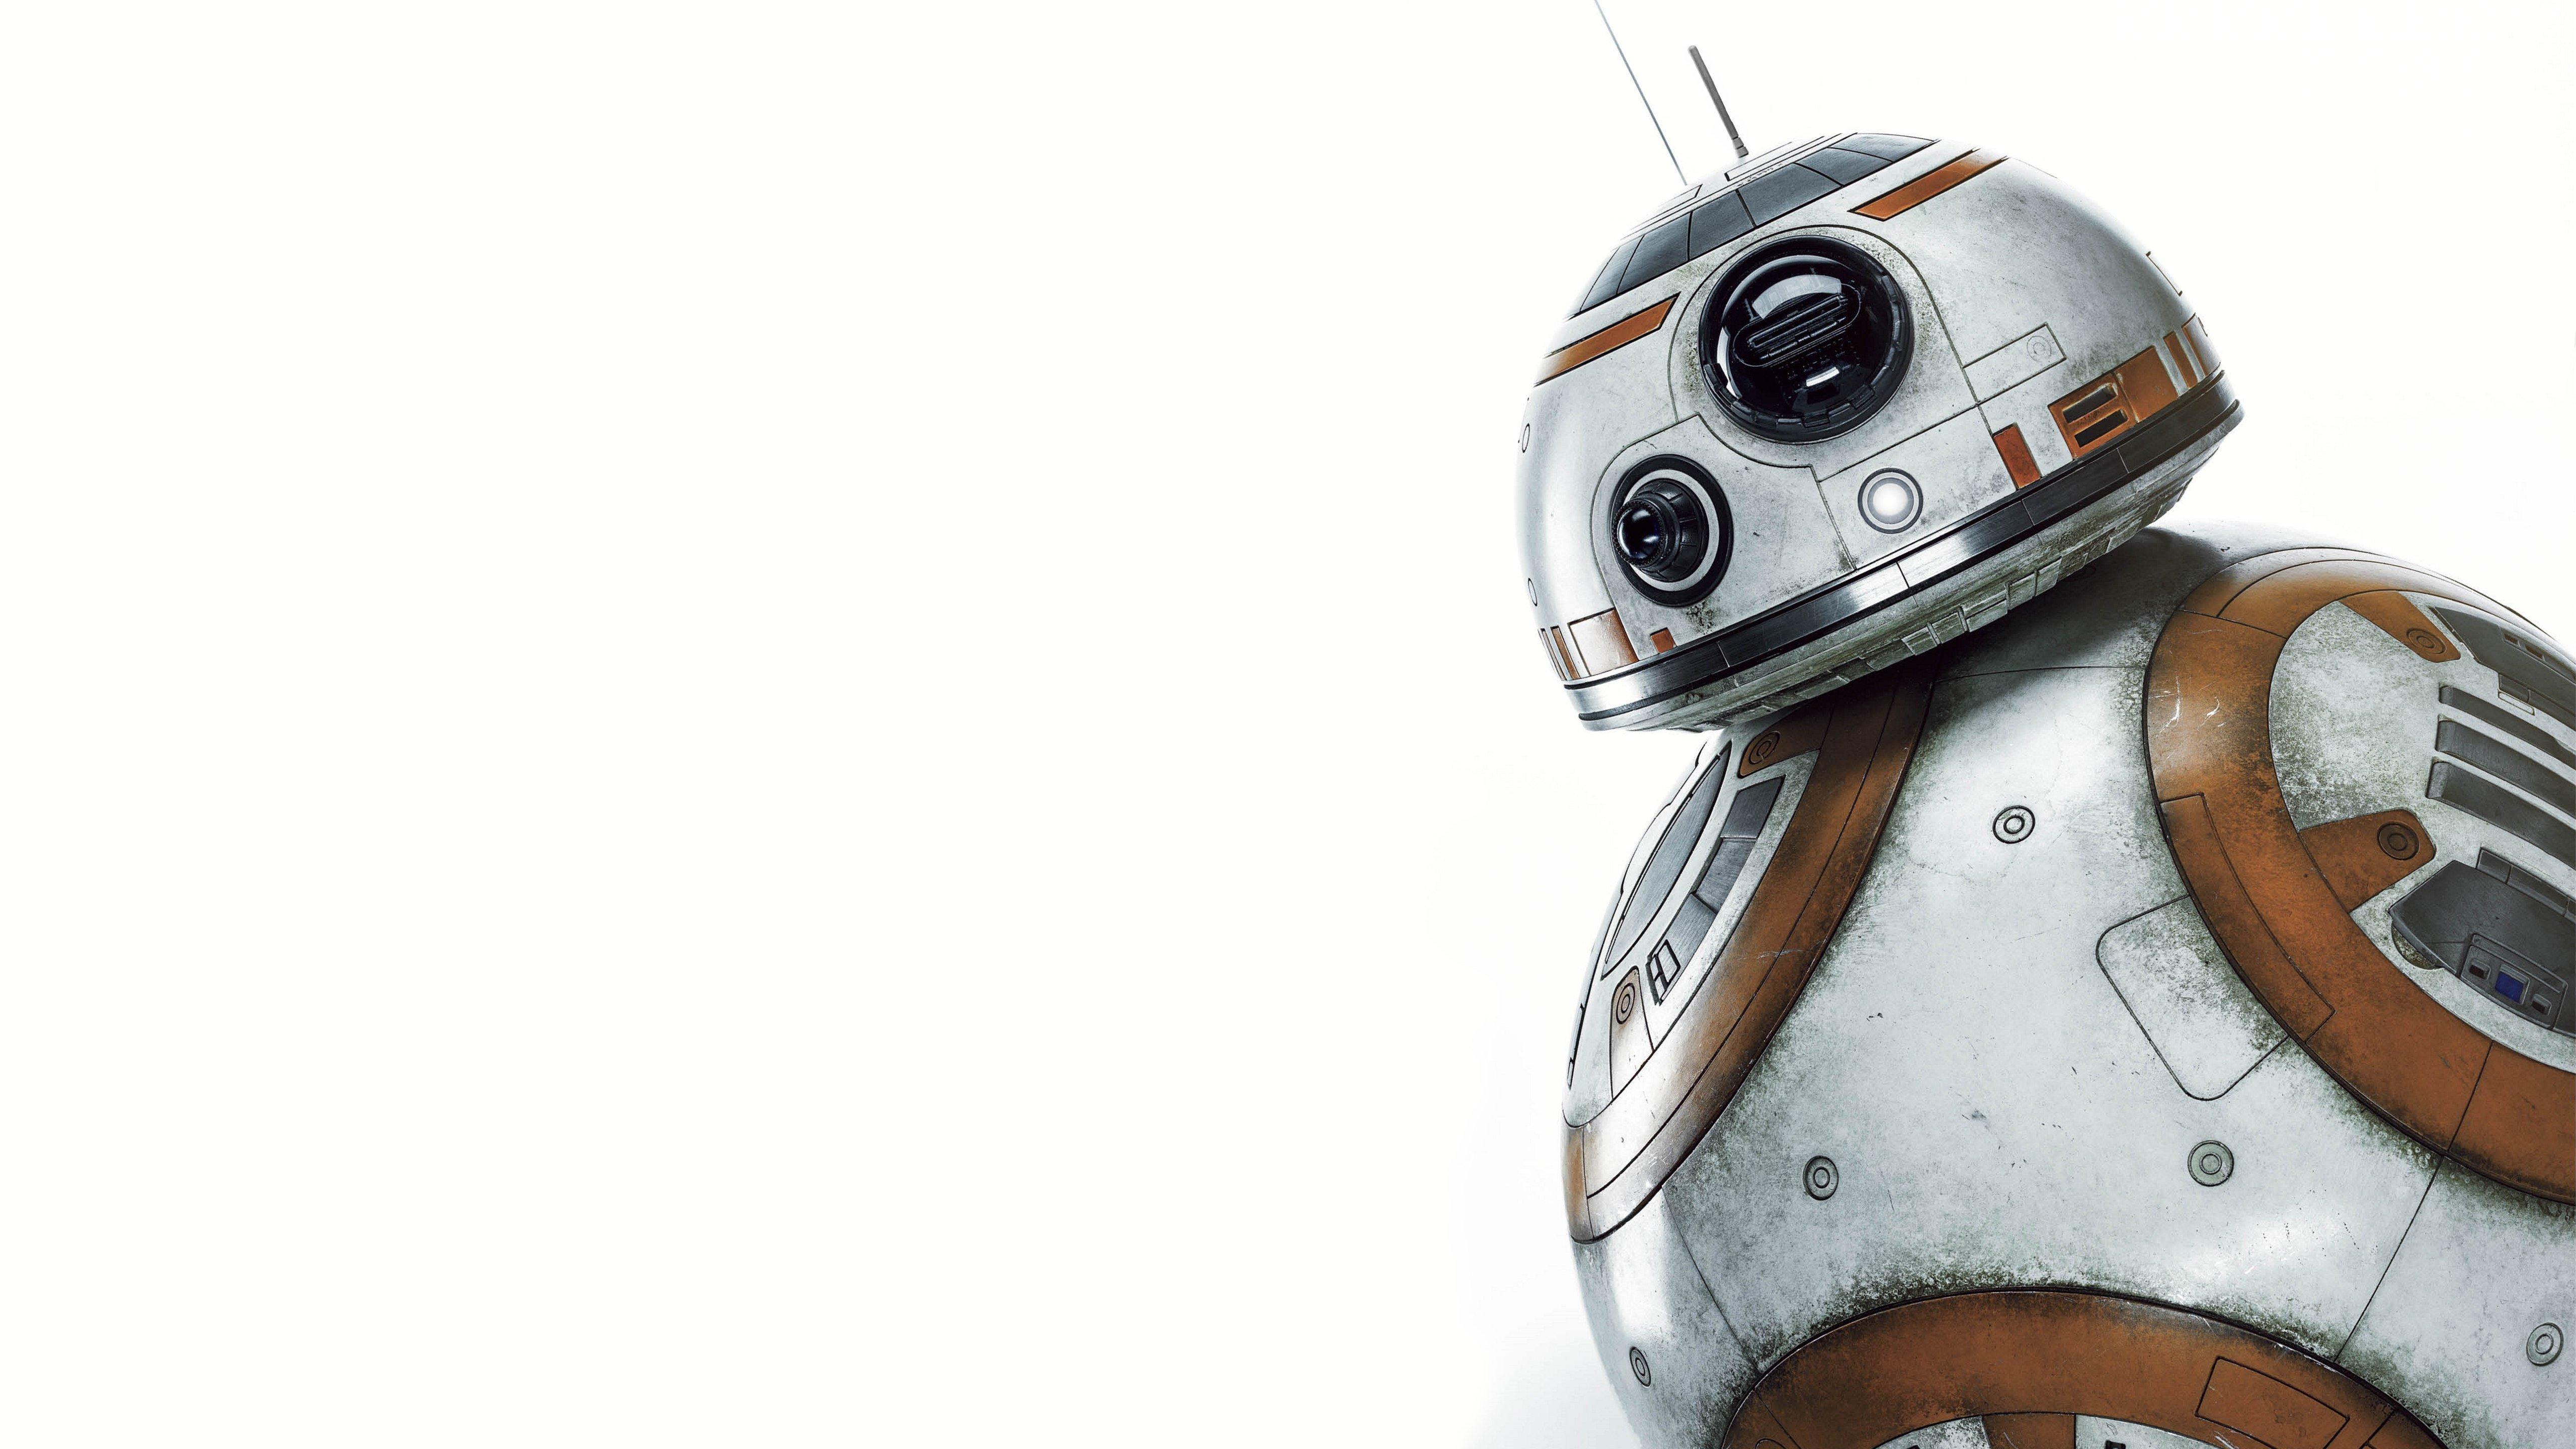 star wars droid wallpaper  5120x2880 Star Wars BB Droid 5k HD 4k Wallpapers, Images ...